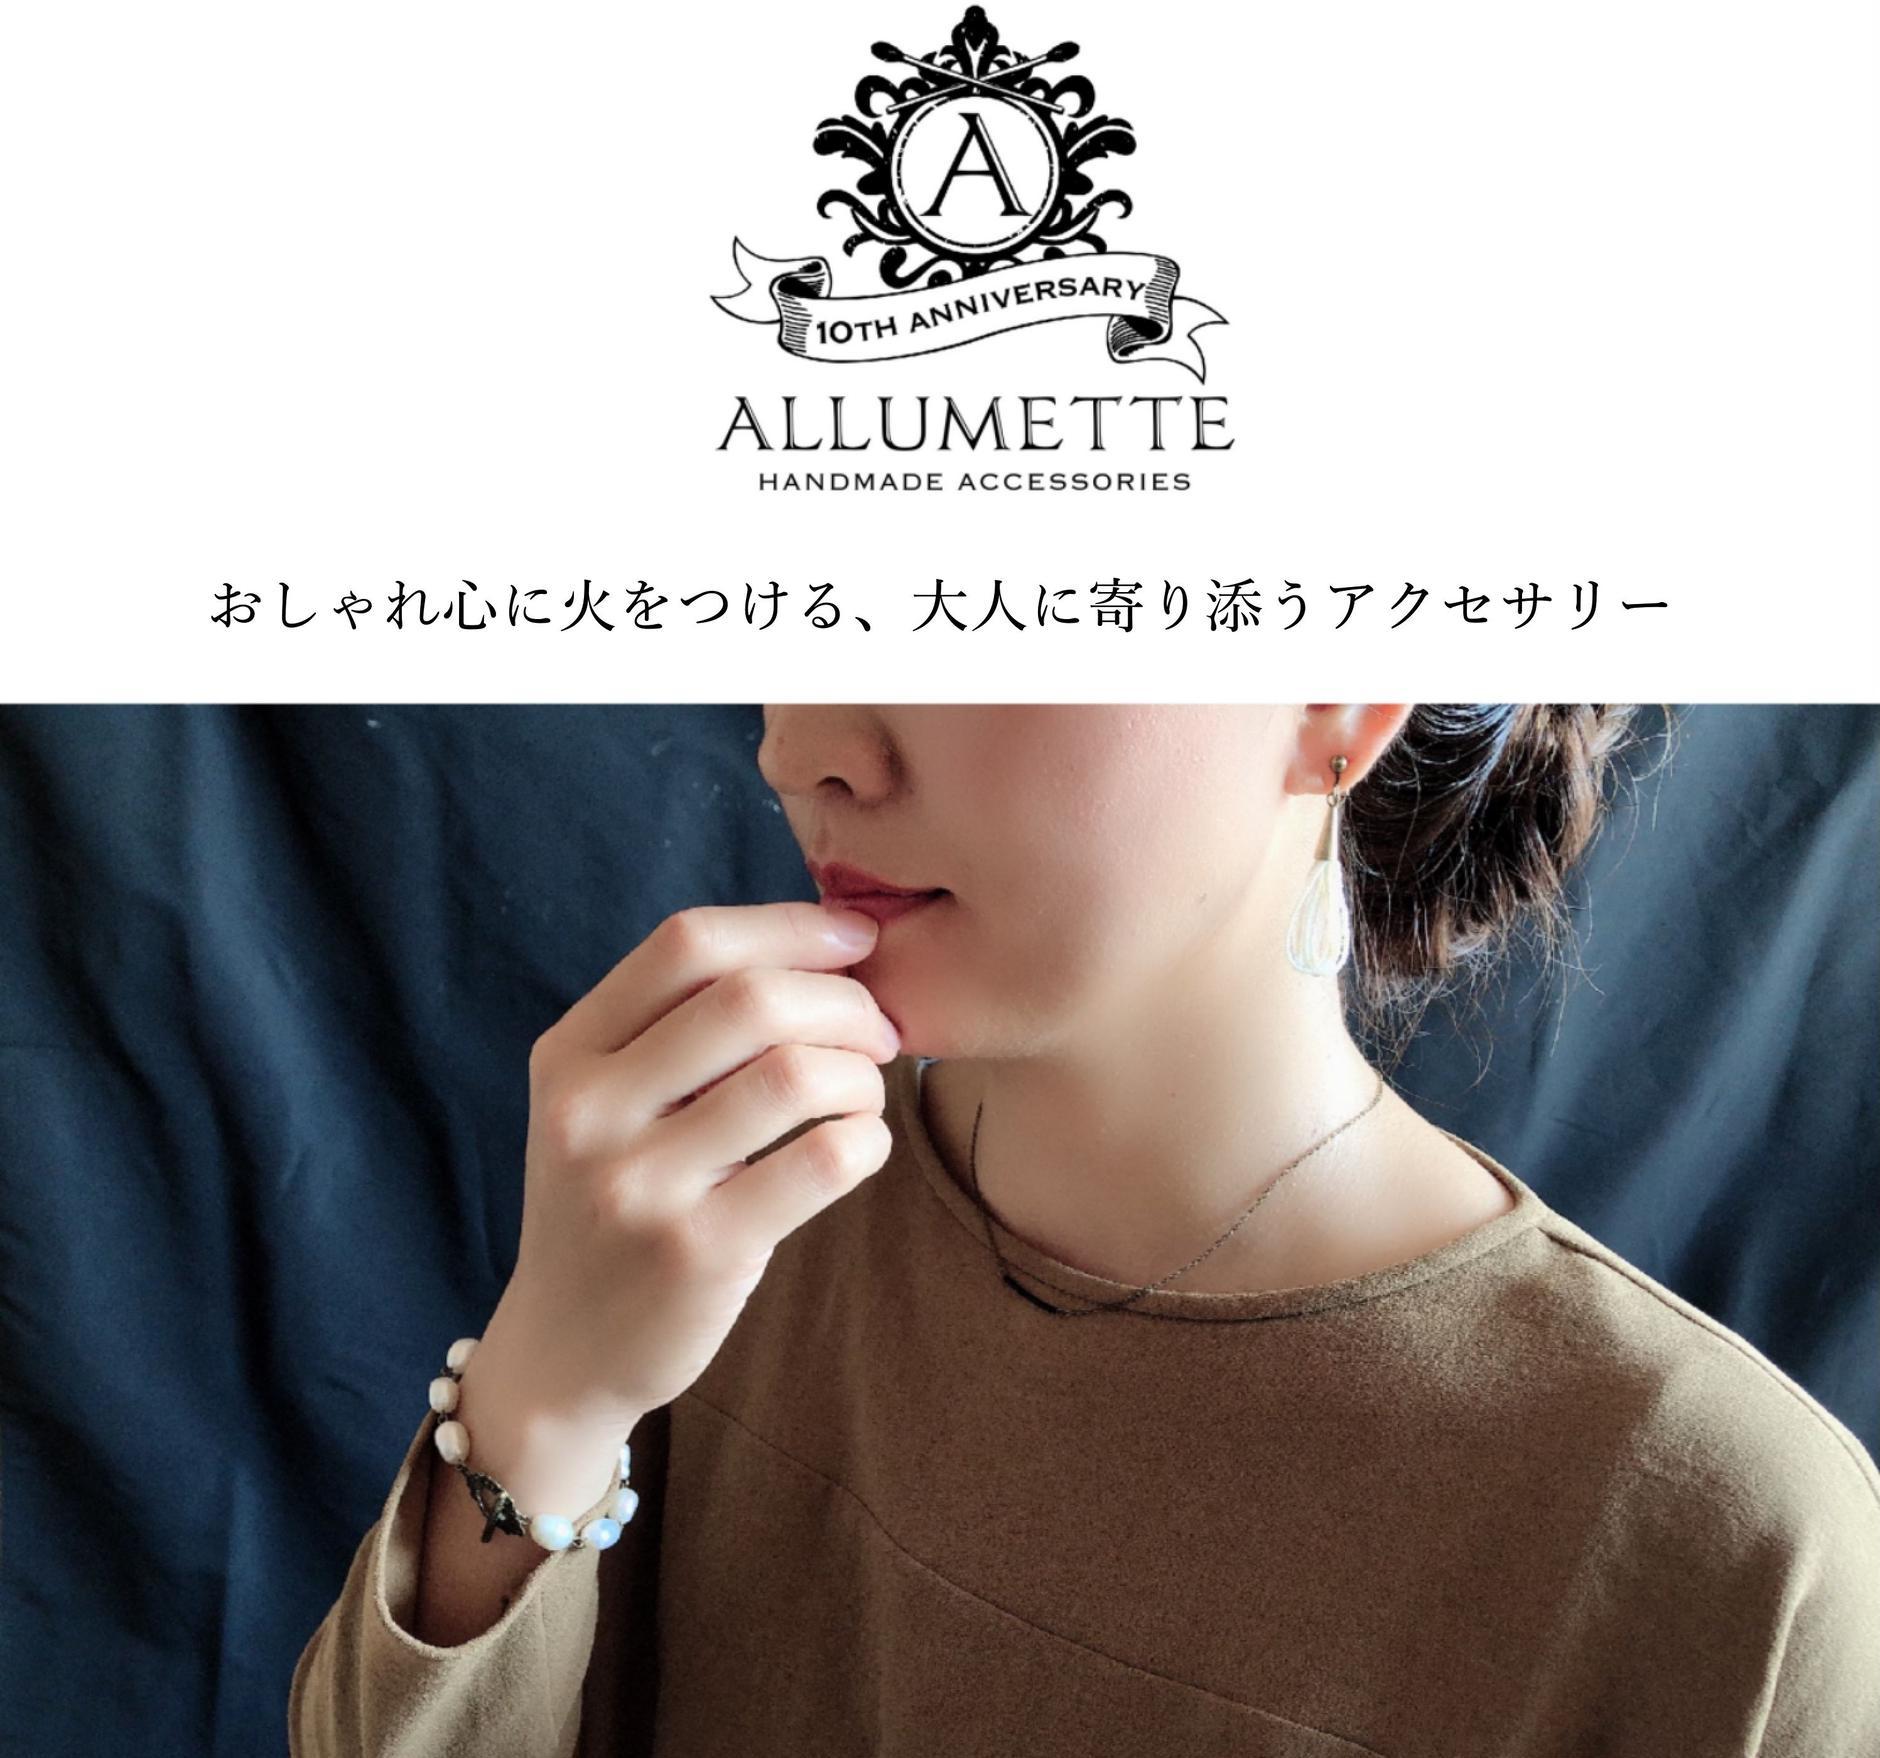 ALLUMETTE